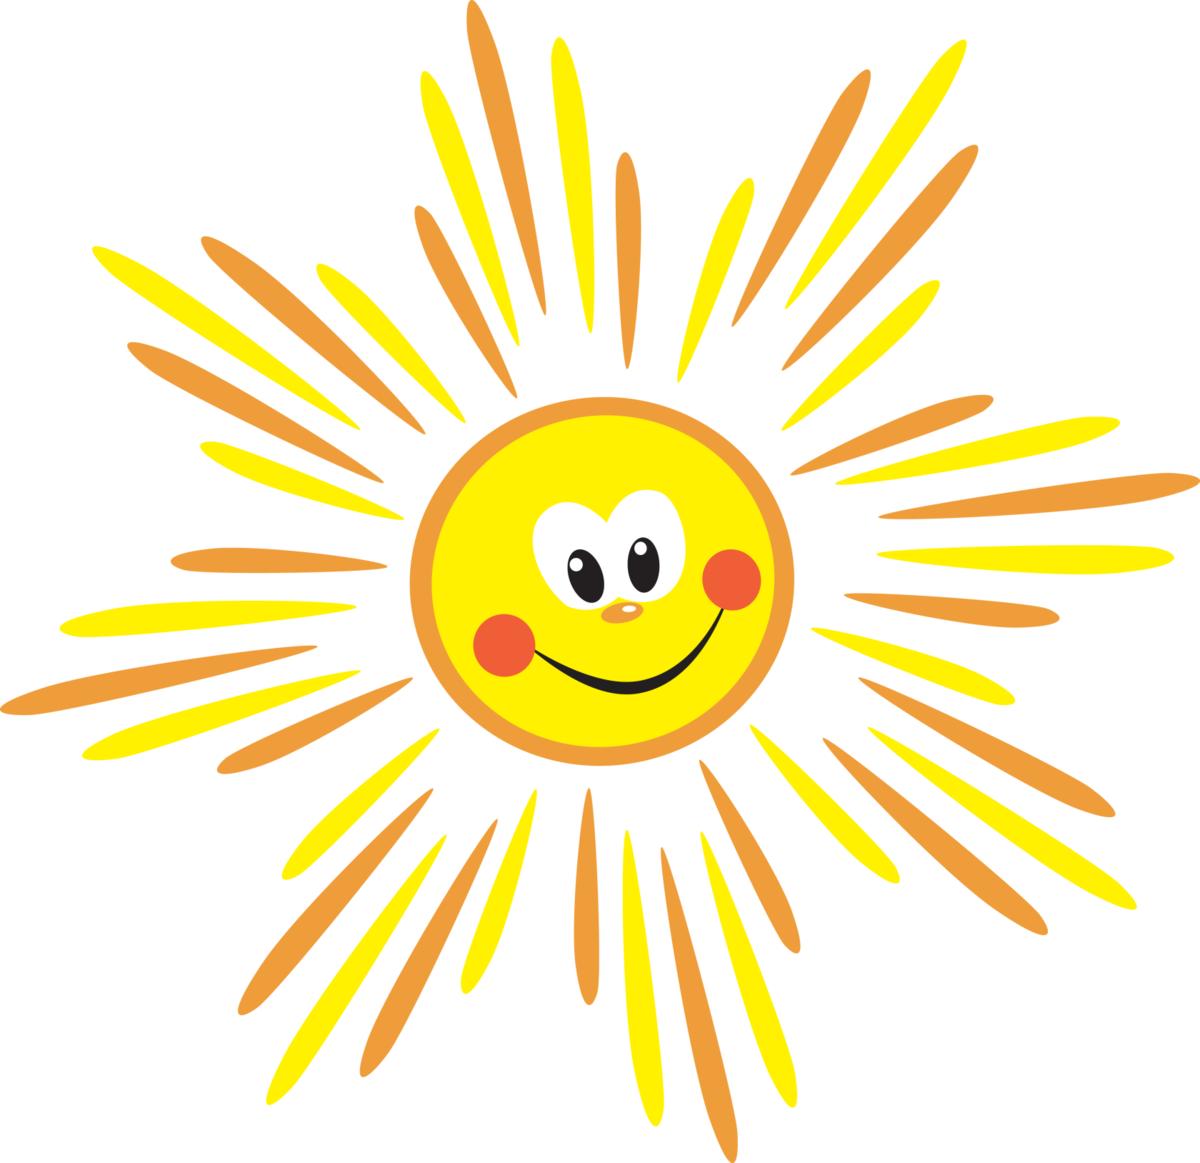 Солнышко картинки из анимации